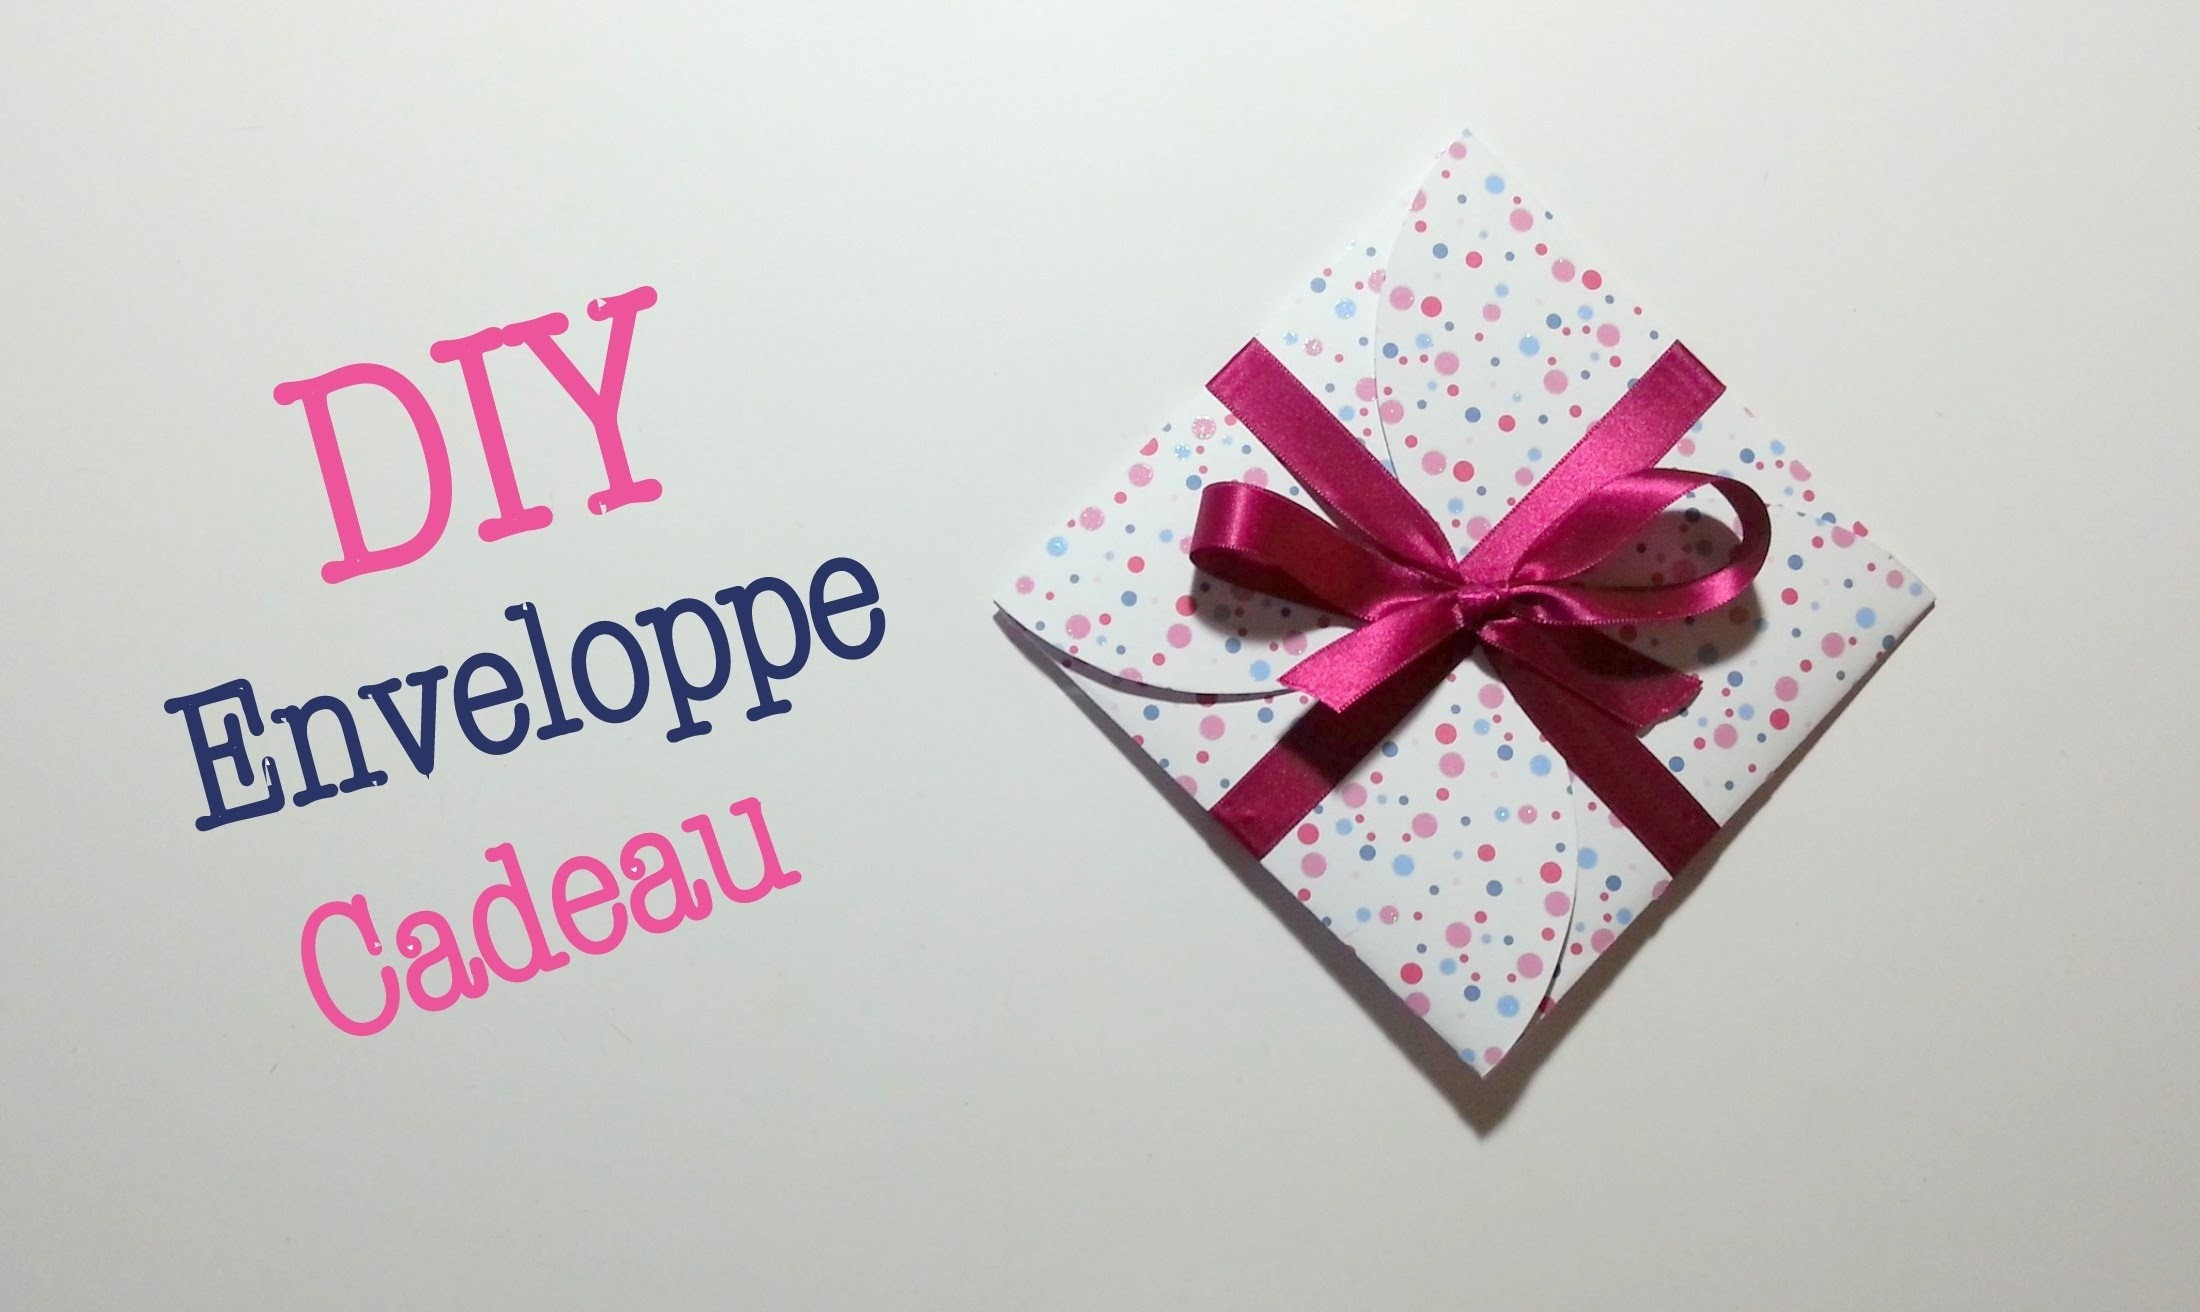 DIY Enveloppe Cadeau